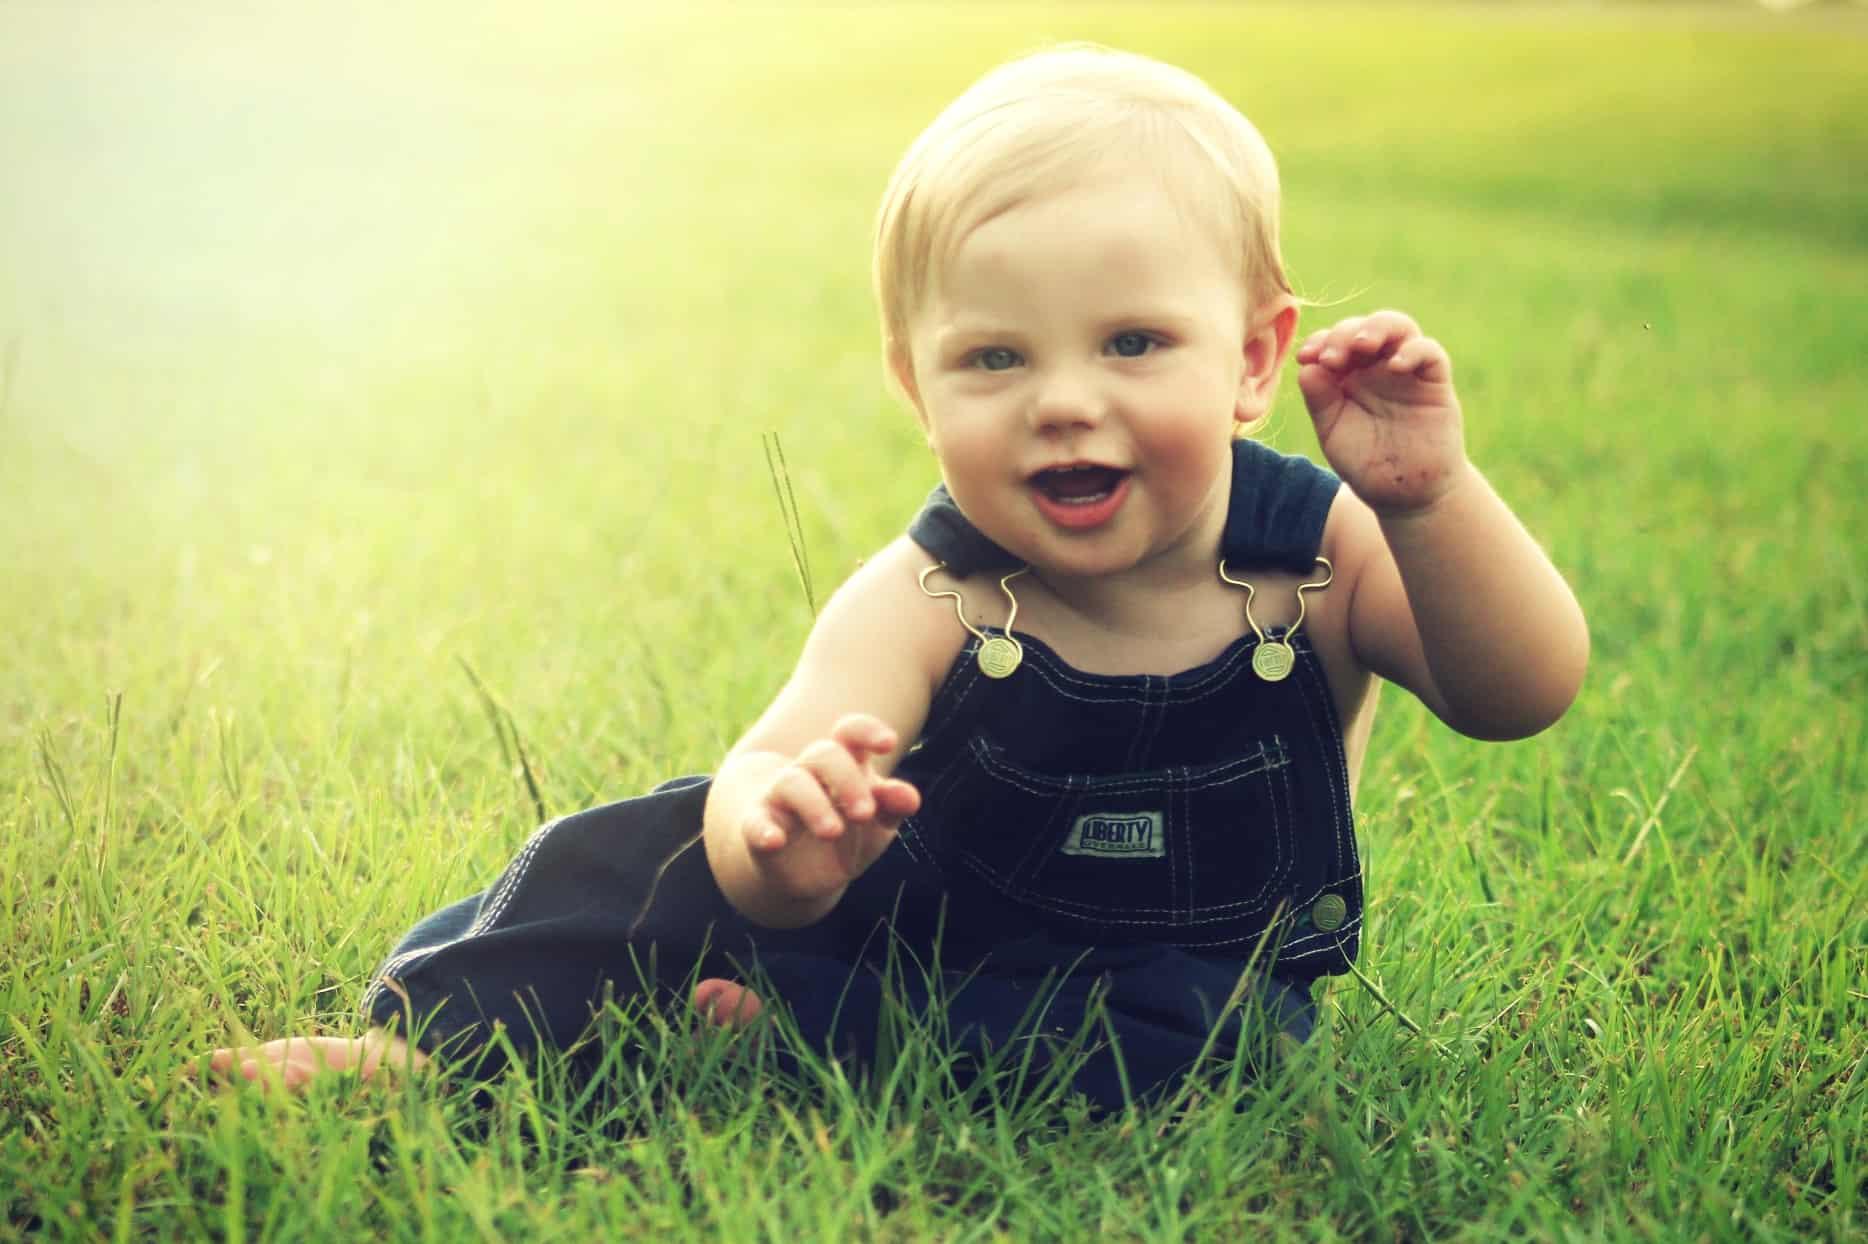 Handsome Baby Boy Names For Little Gentleman